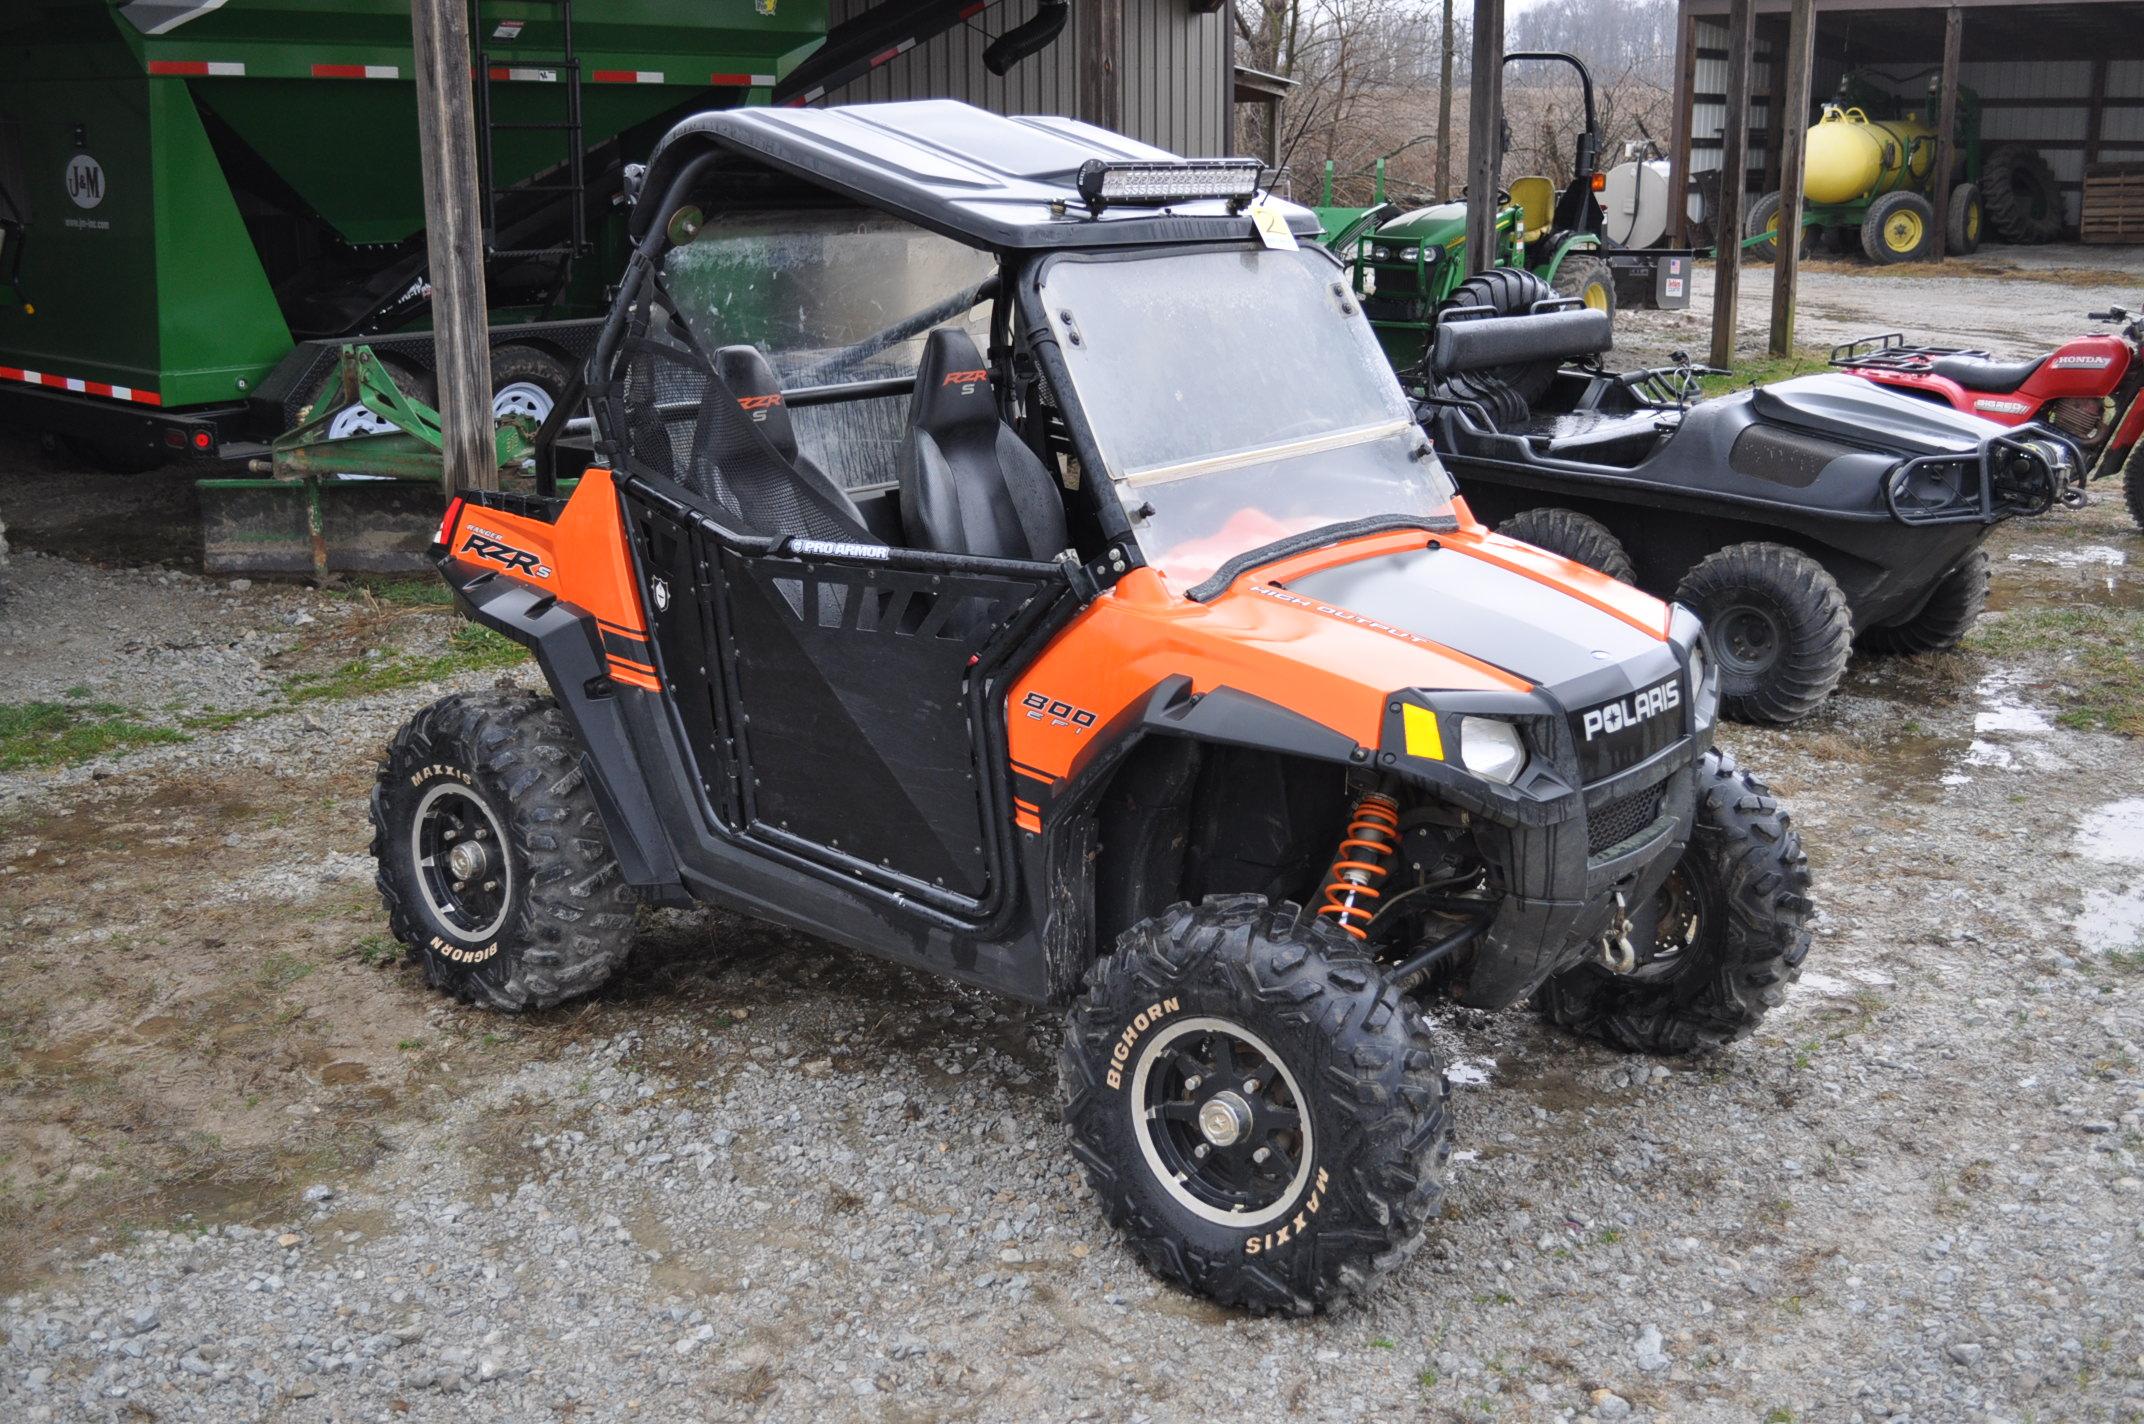 2010 Polaris Ranger RZR, 800 EFI, AT26 x 12 R 12 rear, AT26 x 9 R 12 front, half doors, 102 hrs, 899 - Image 4 of 9